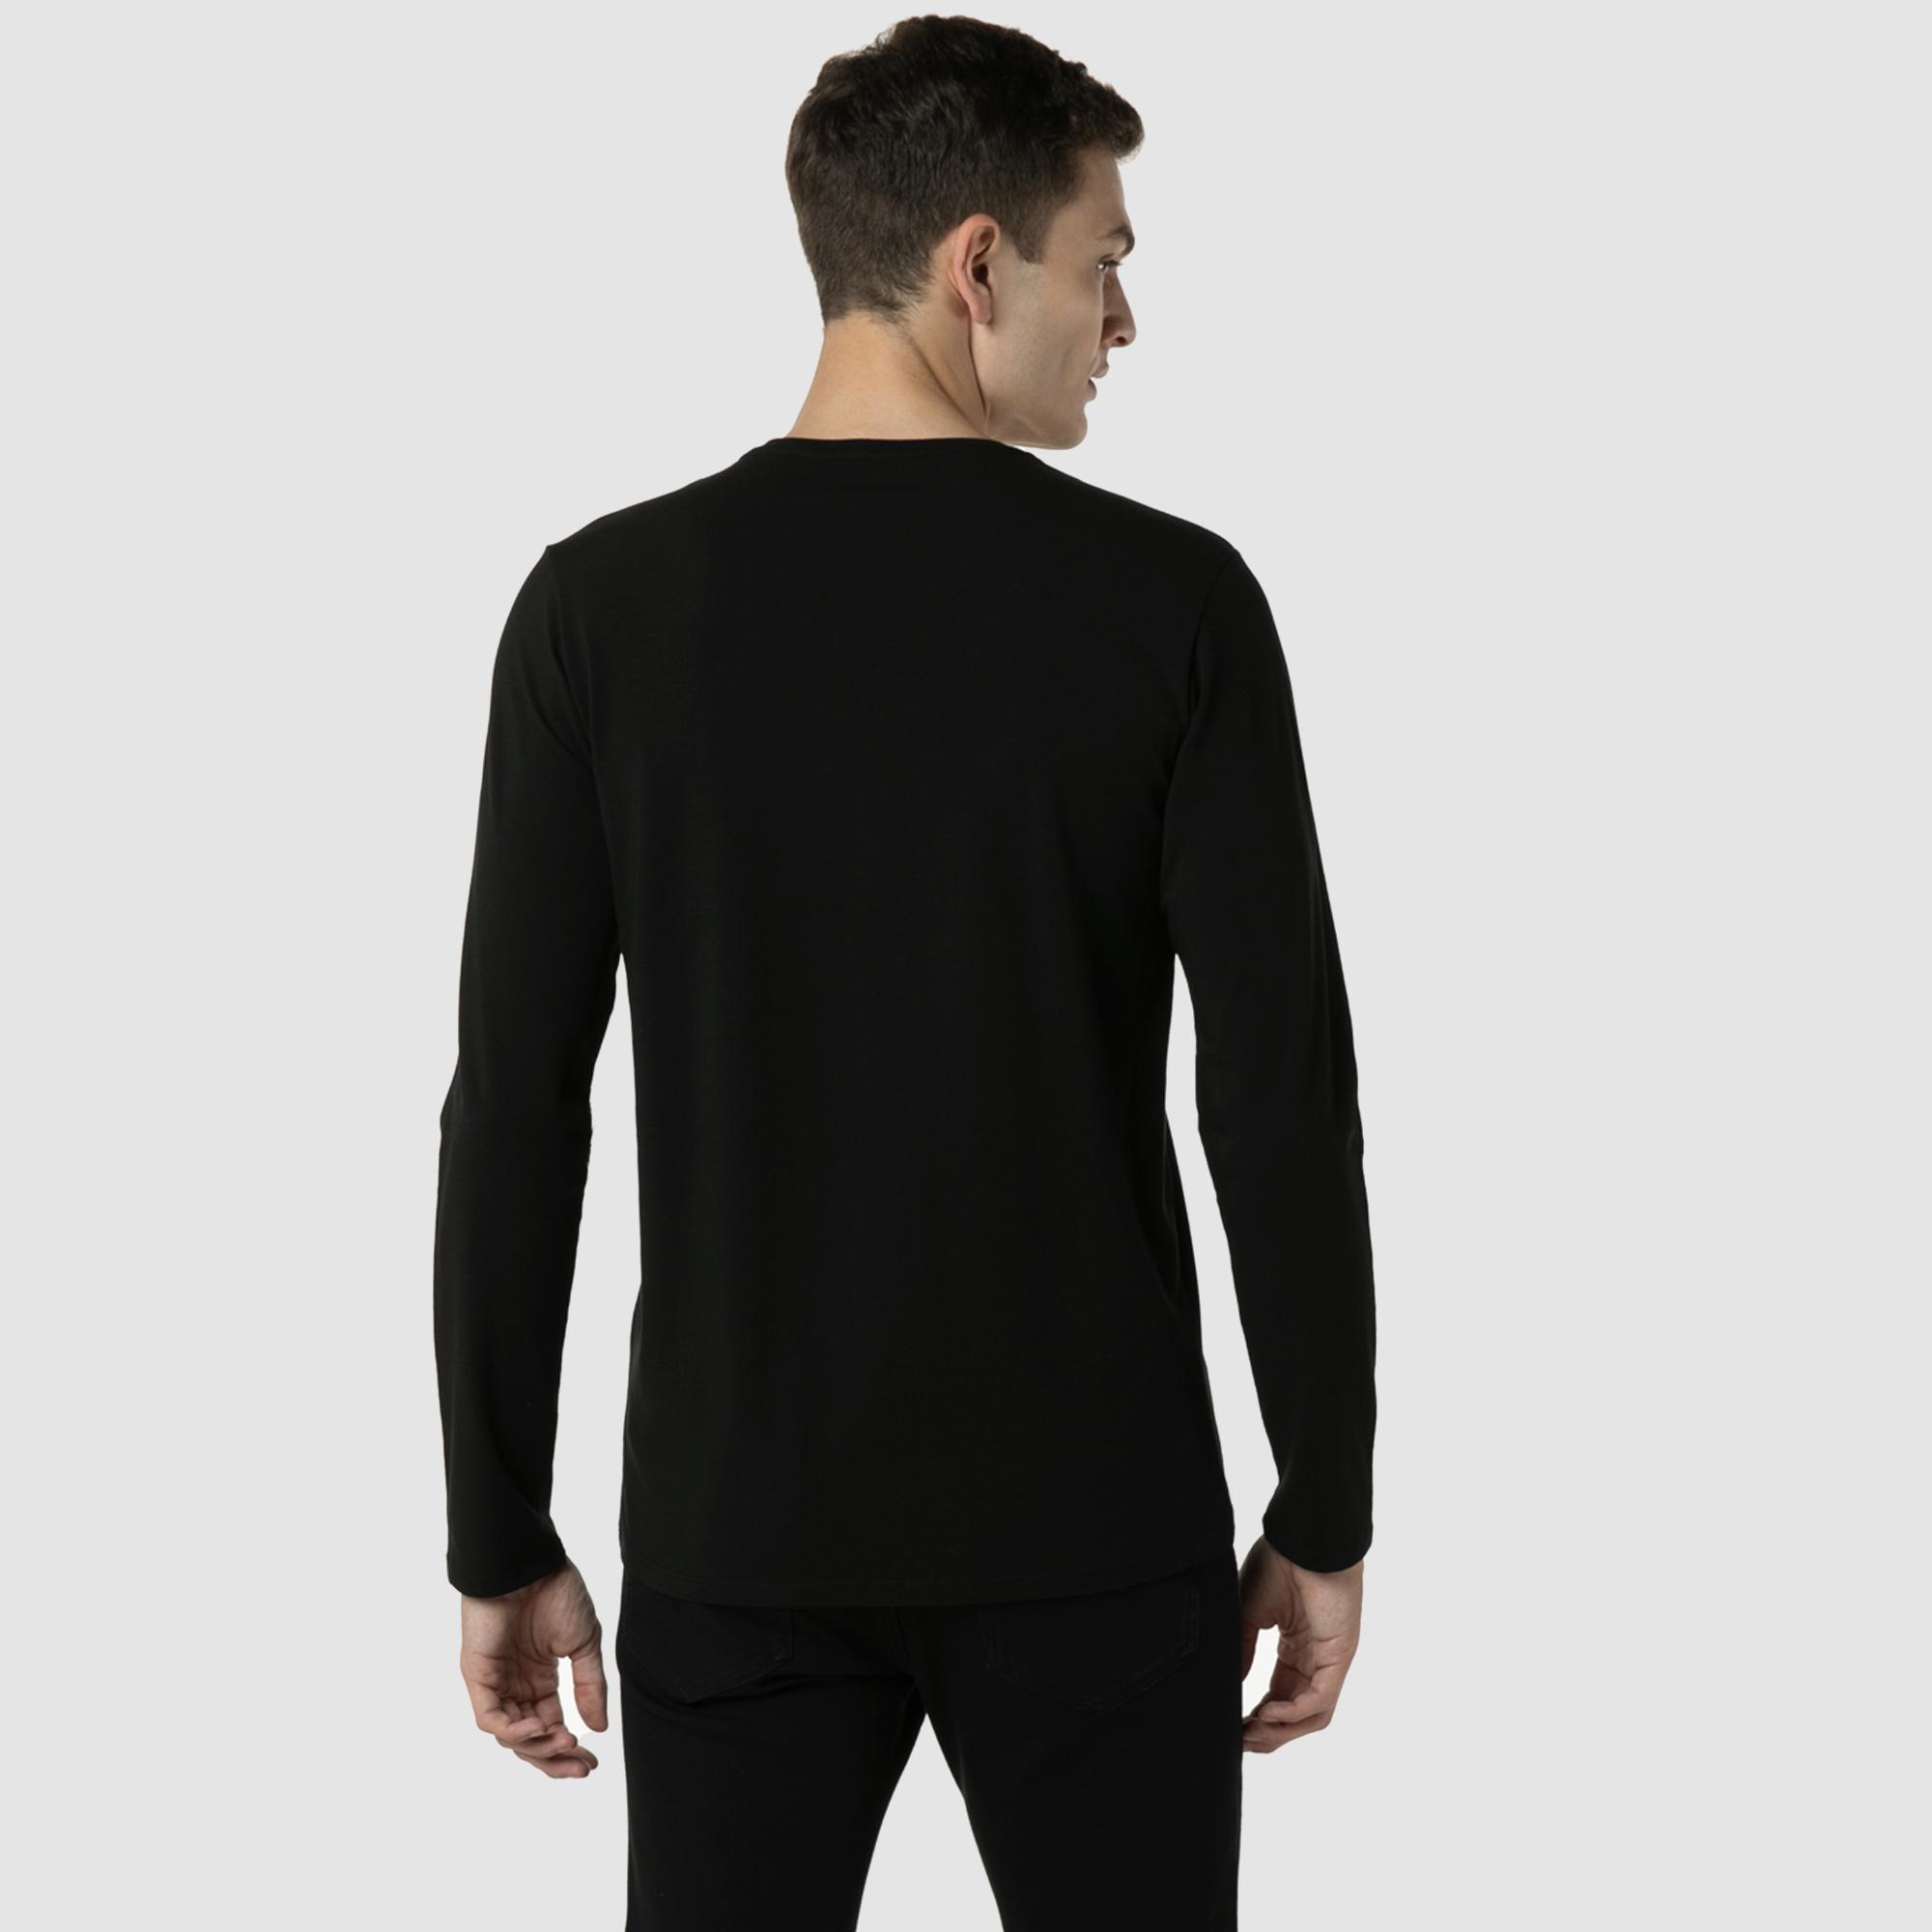 Lacoste Erkek Regular Fit Uzun Kollu V Yaka Siyah T-Shirt